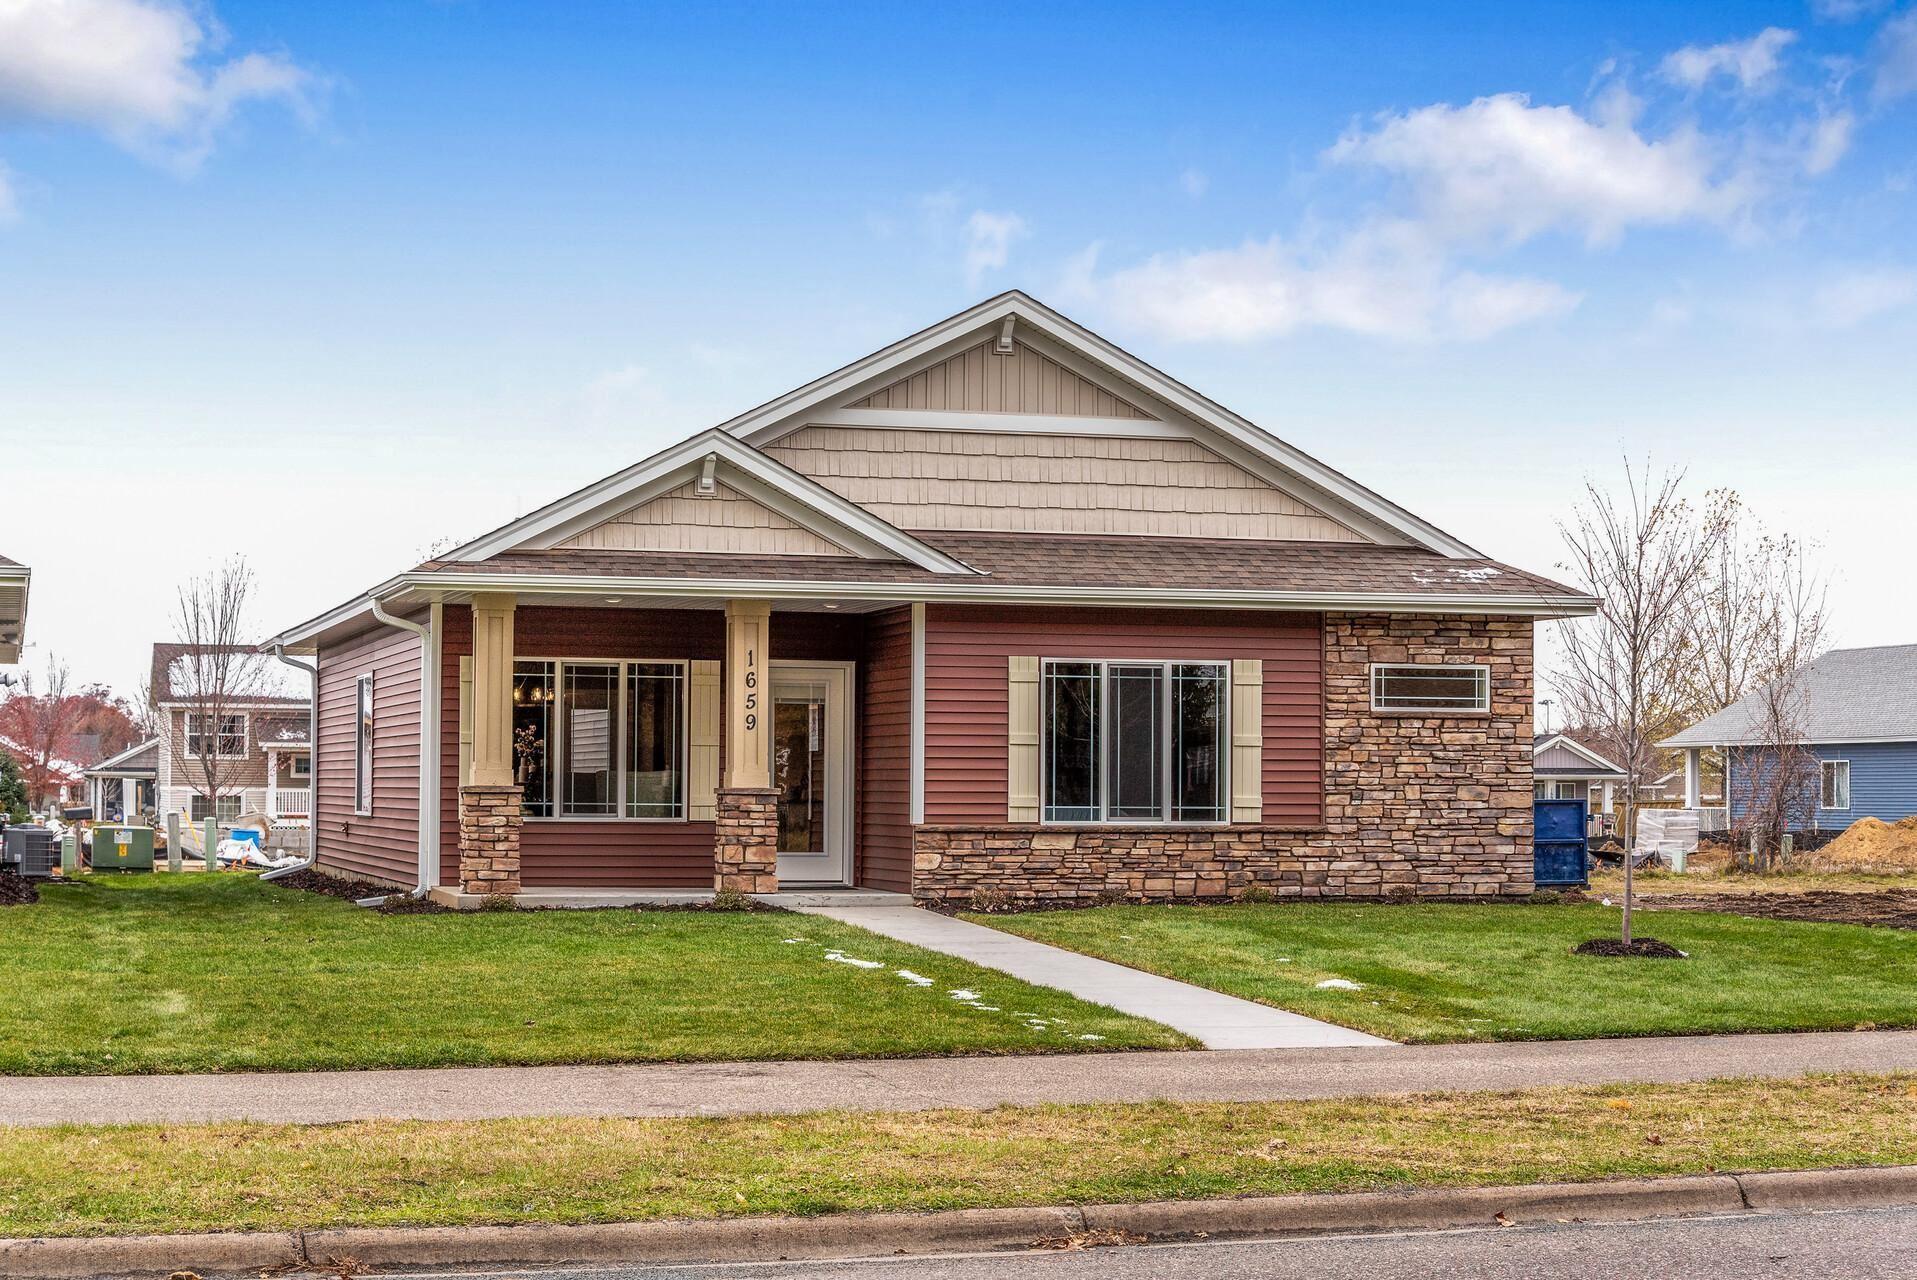 1659 Dellwood Street S, Cambridge, MN 55008 - MLS#: 5645079